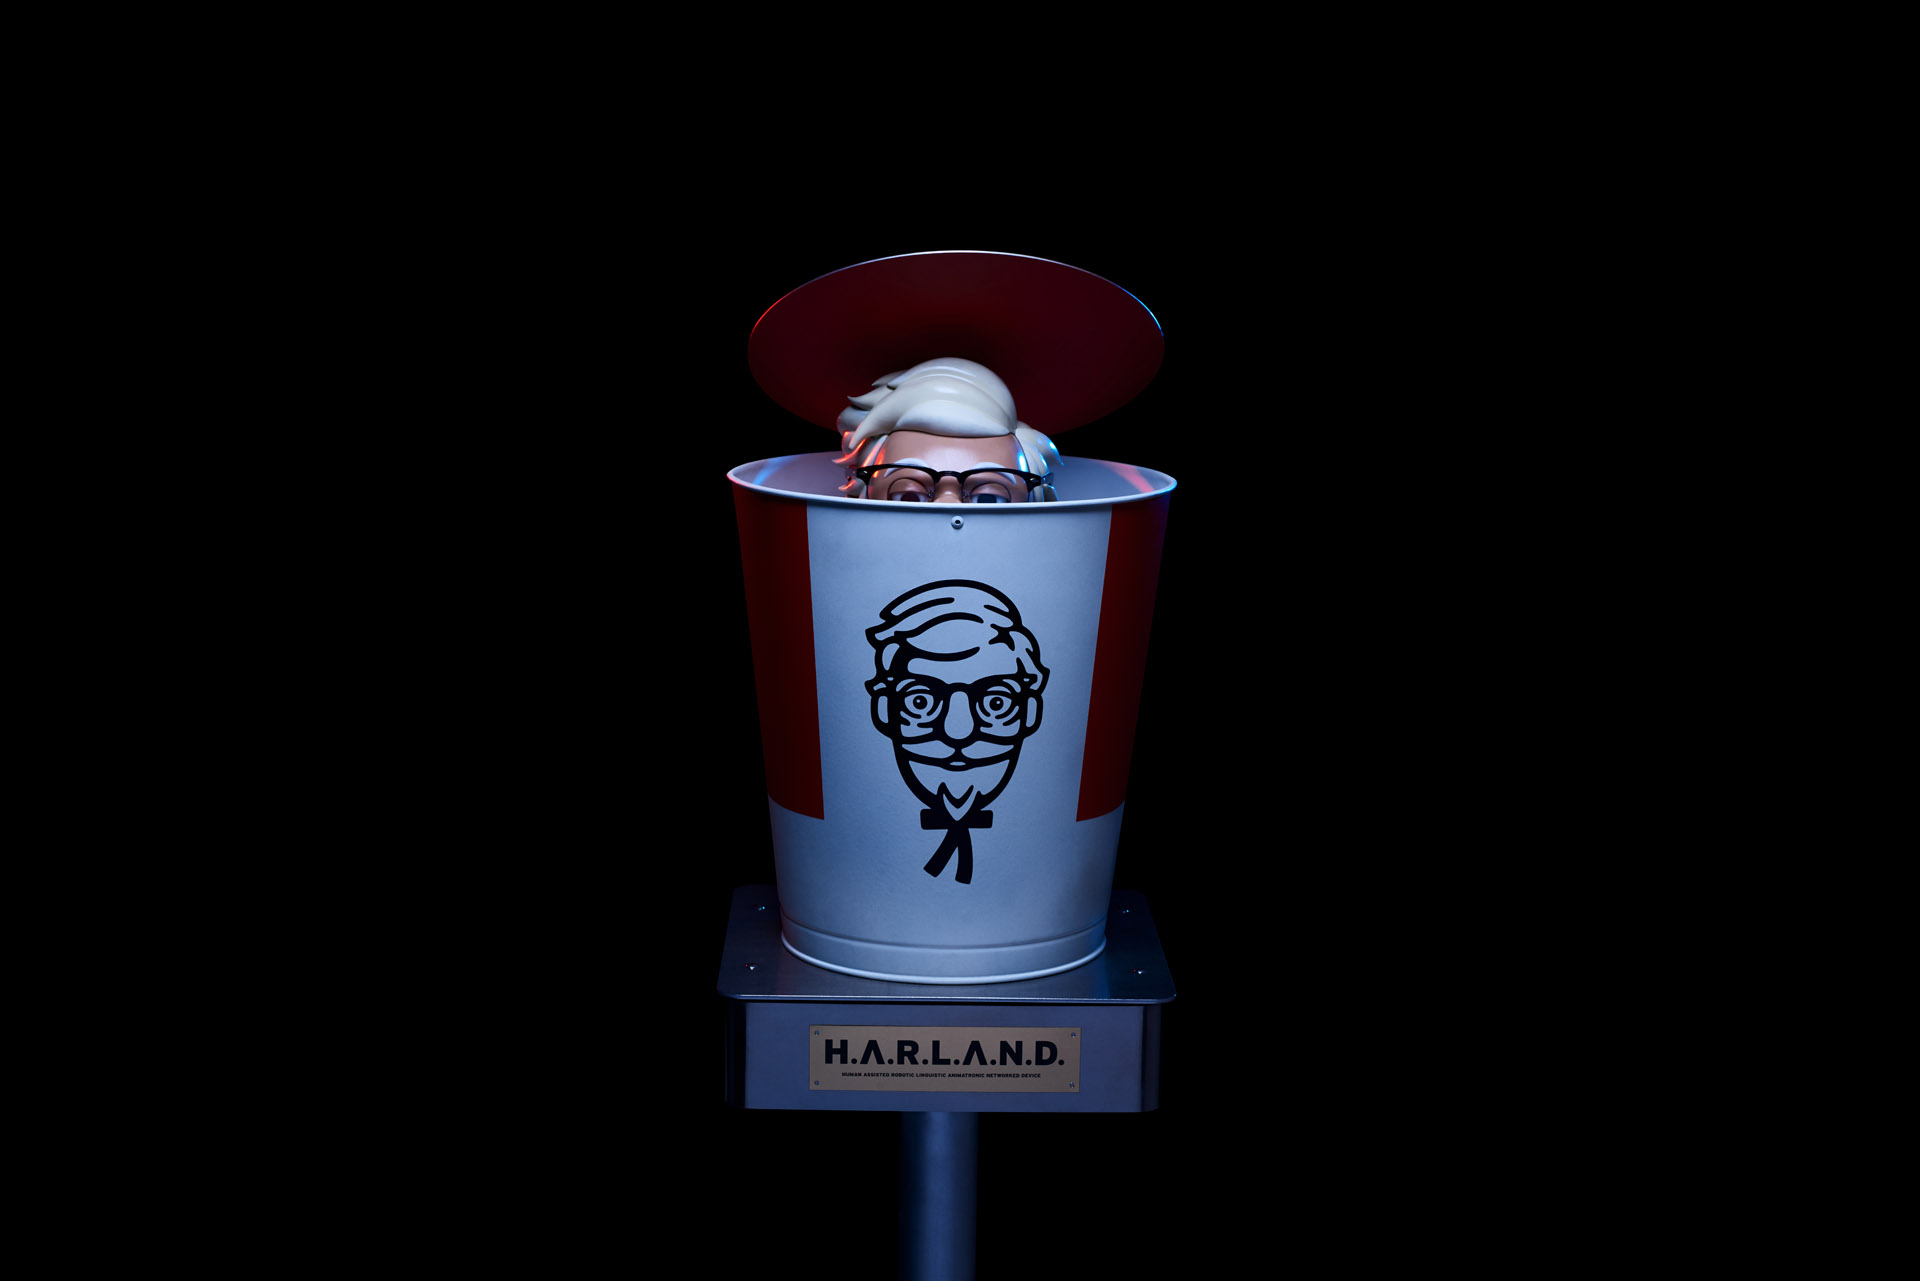 062017_KFC_HARLAND_37131_animation_1.jpg